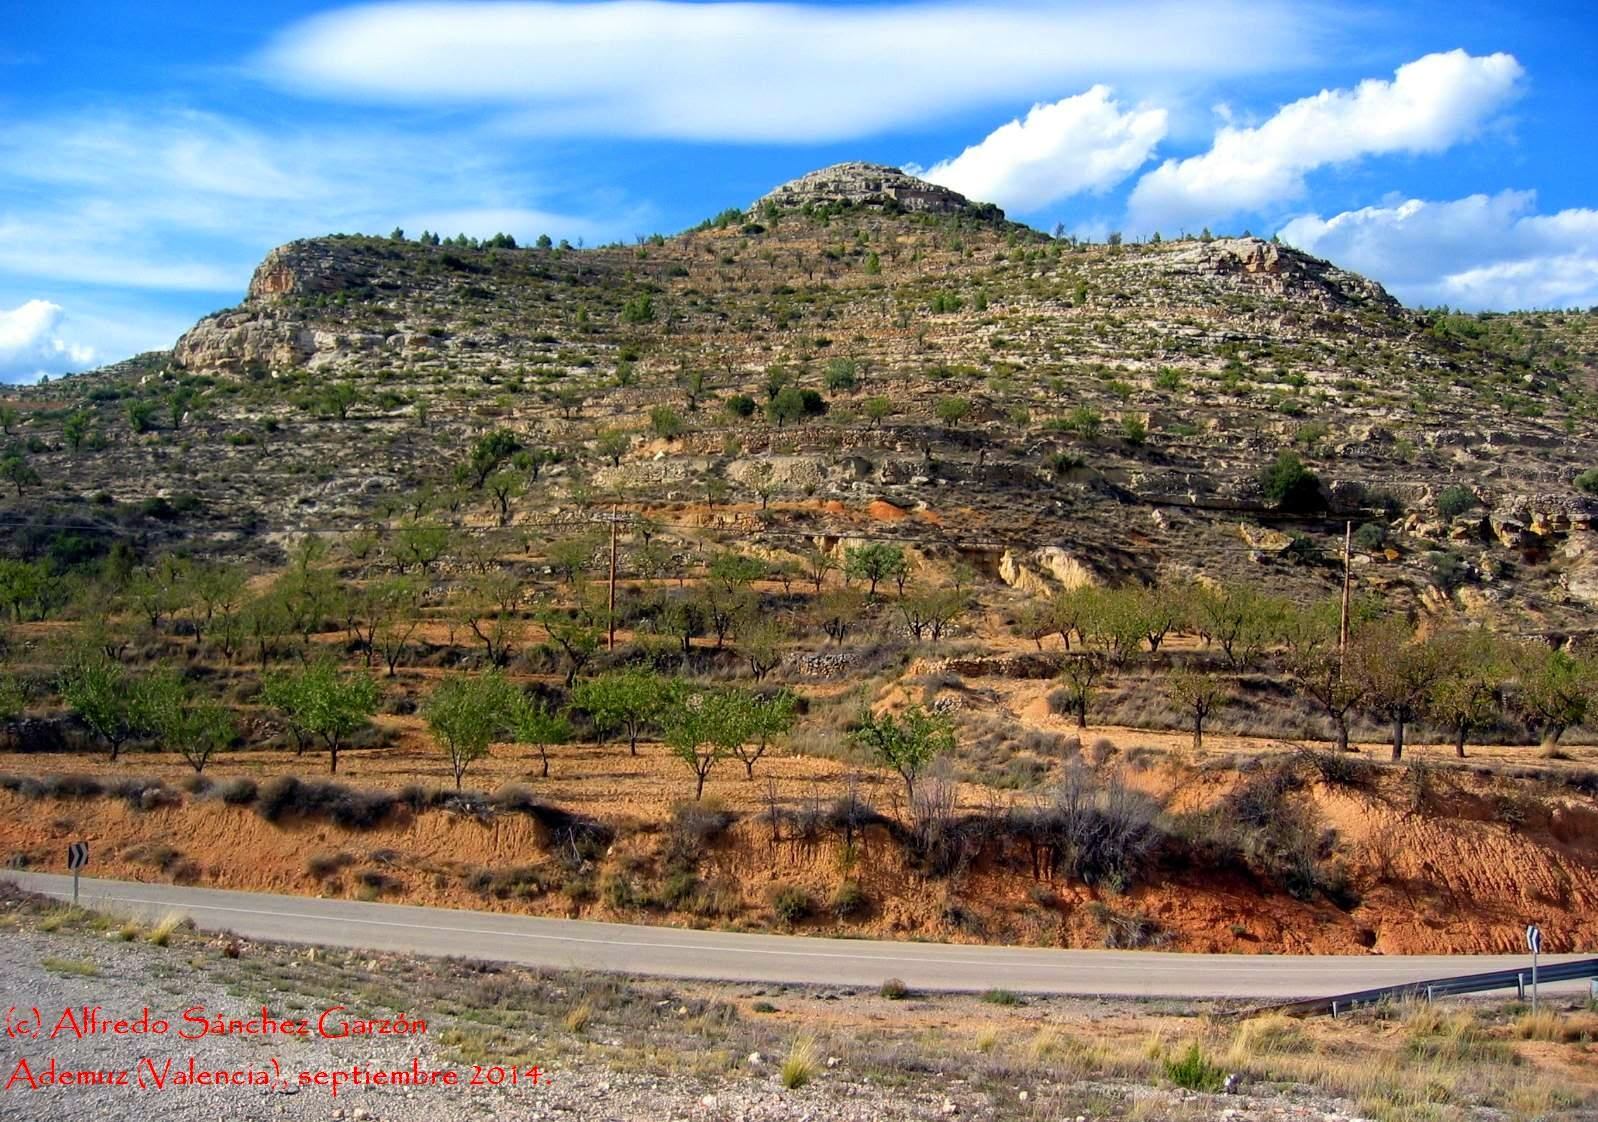 carretera-vallanca-cv-478-mirador-hoz-ademuz